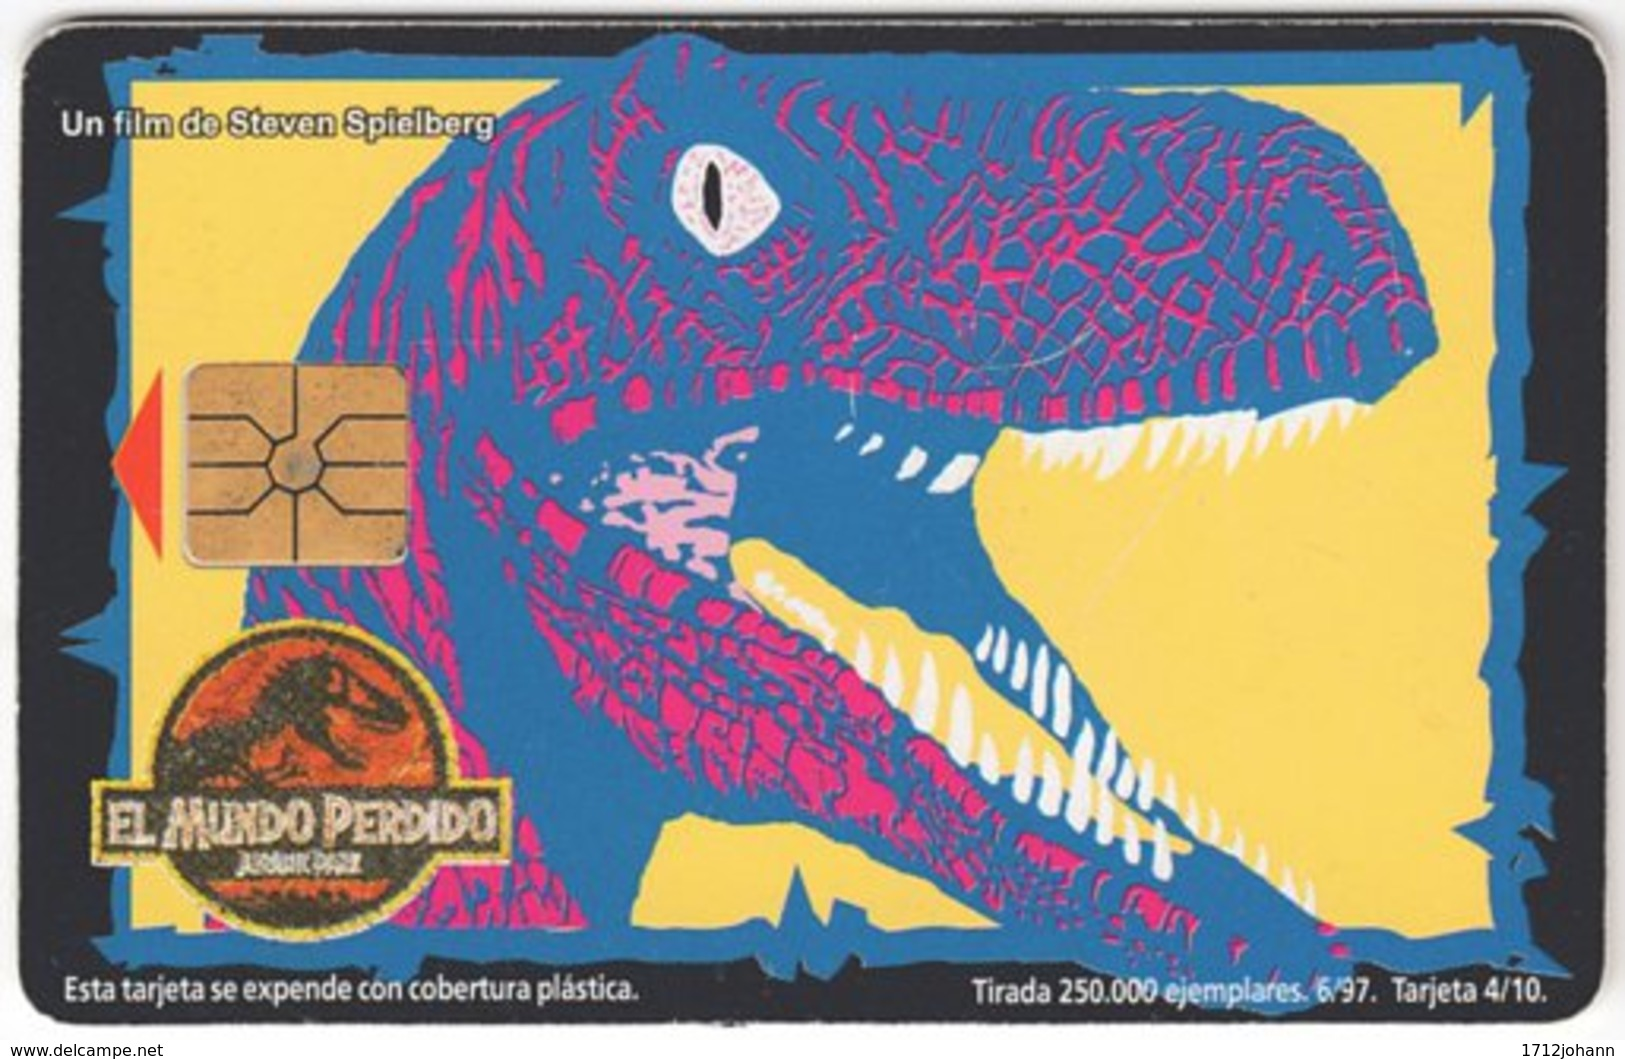 ARGENTINIA A-345 Chip Telecom - Cinema, The Lost World / Prehistoric Animal, Dinosaur - Used - Argentinien